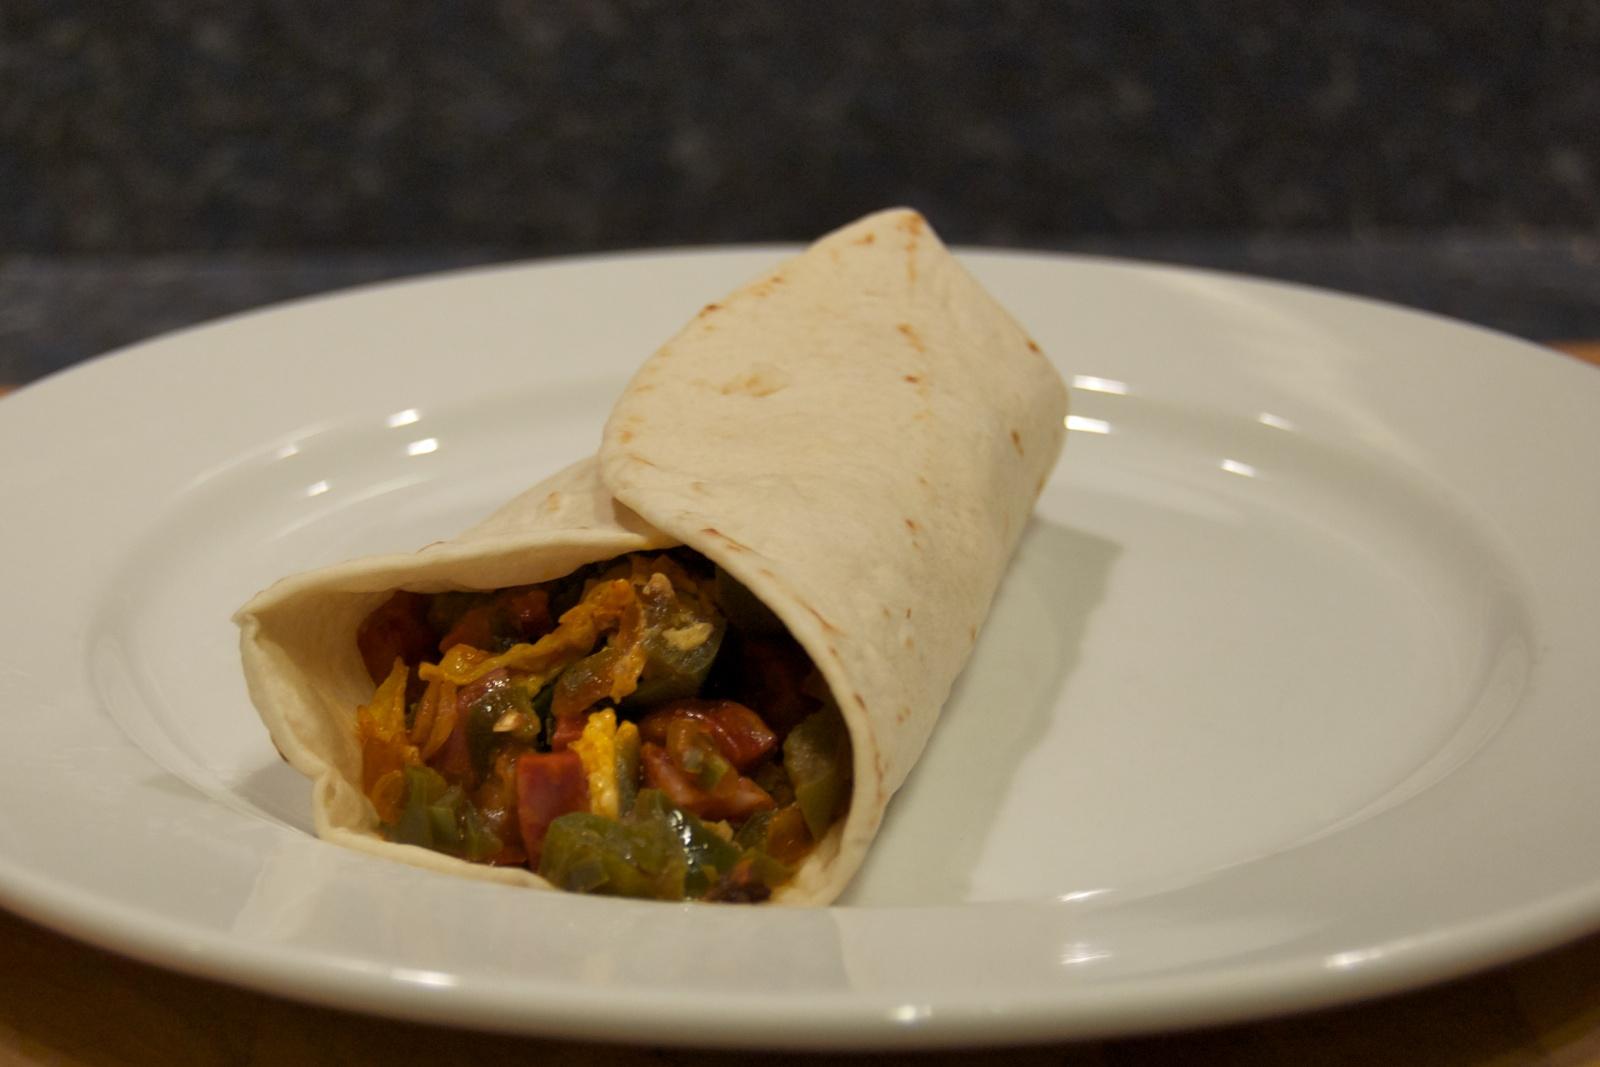 http://blog.rickk.com/food/2011/12/14/ate.2011.12.14.b.jpg